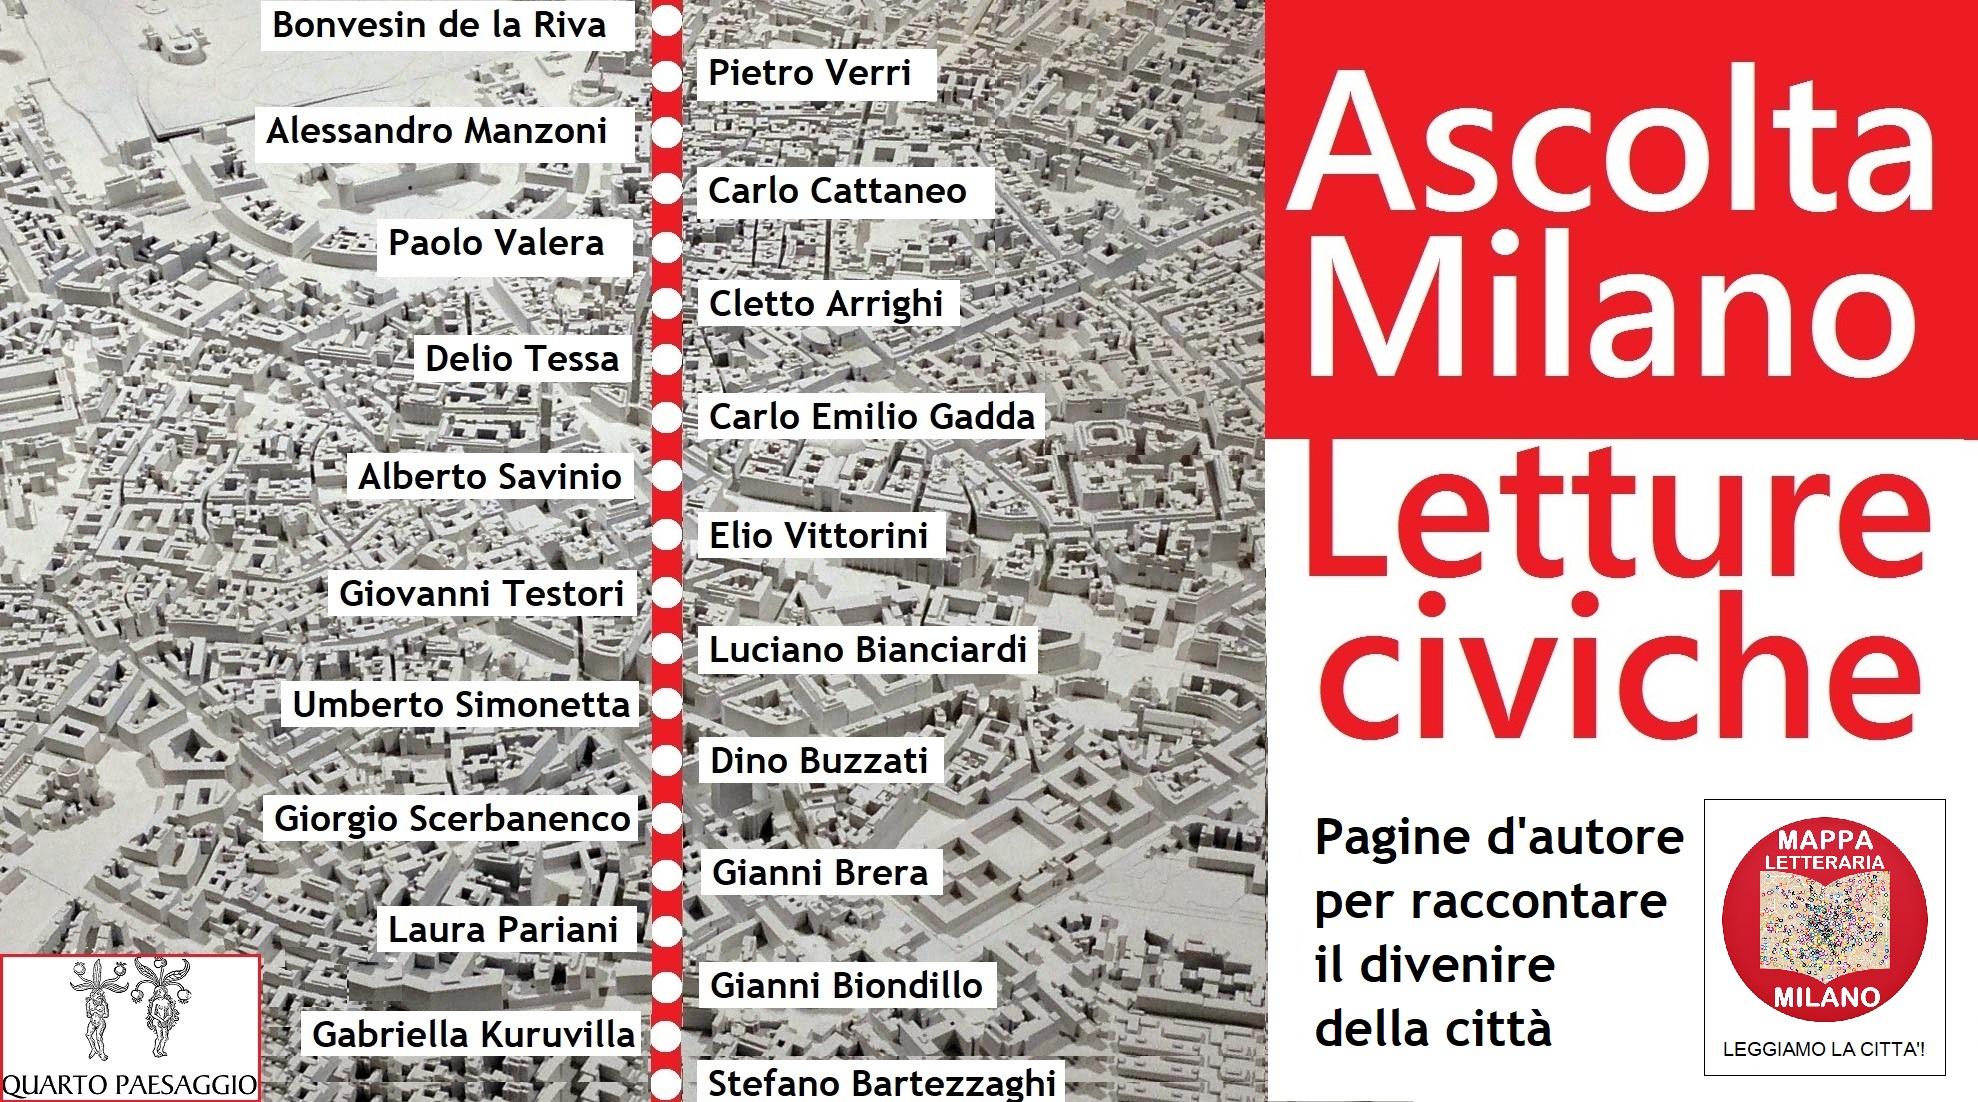 Ascolta Milano